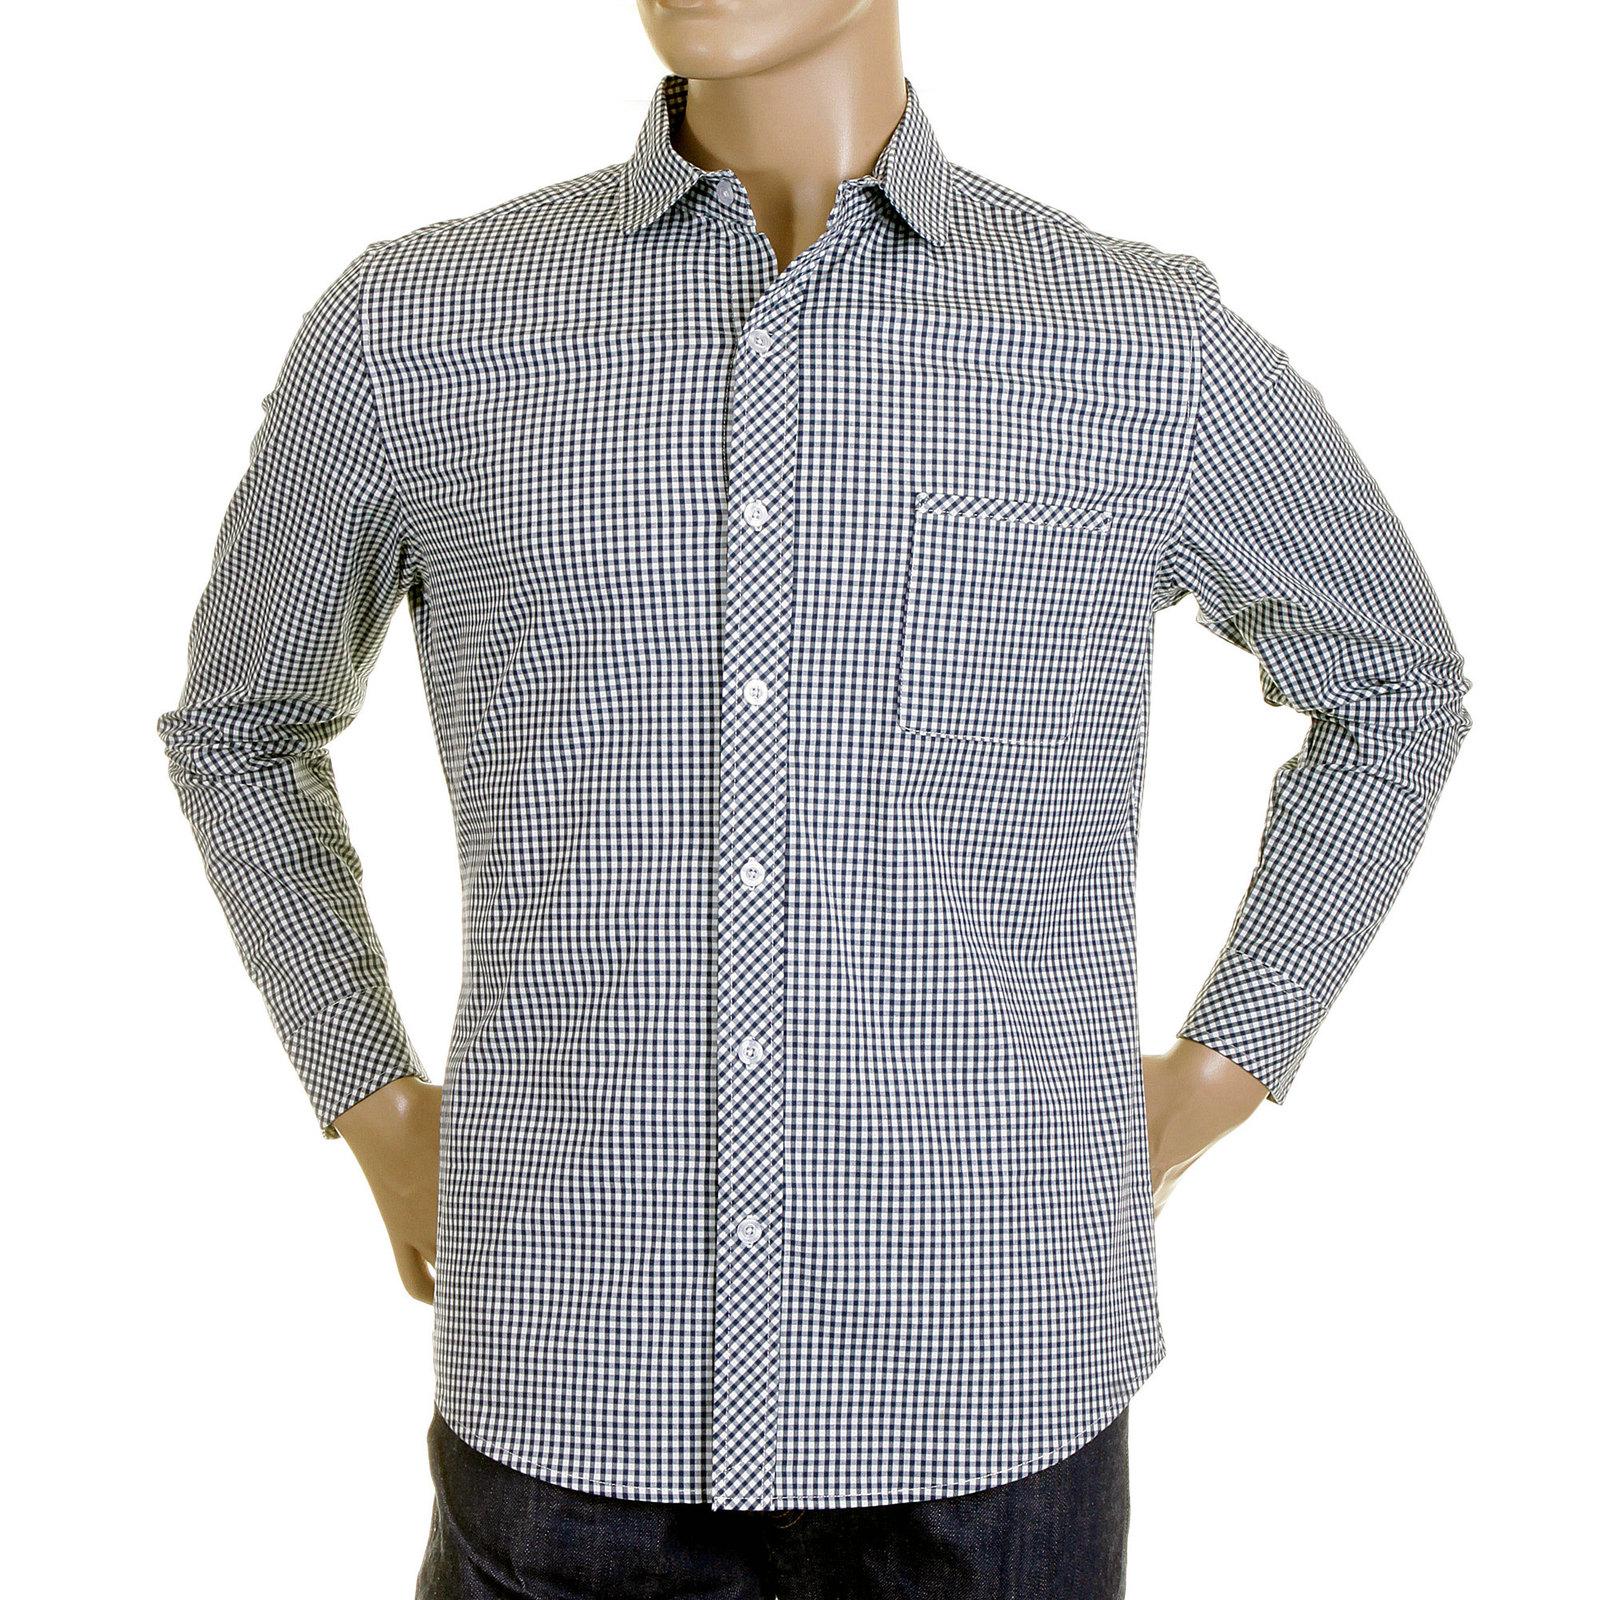 Mens Long Tail T Shirts